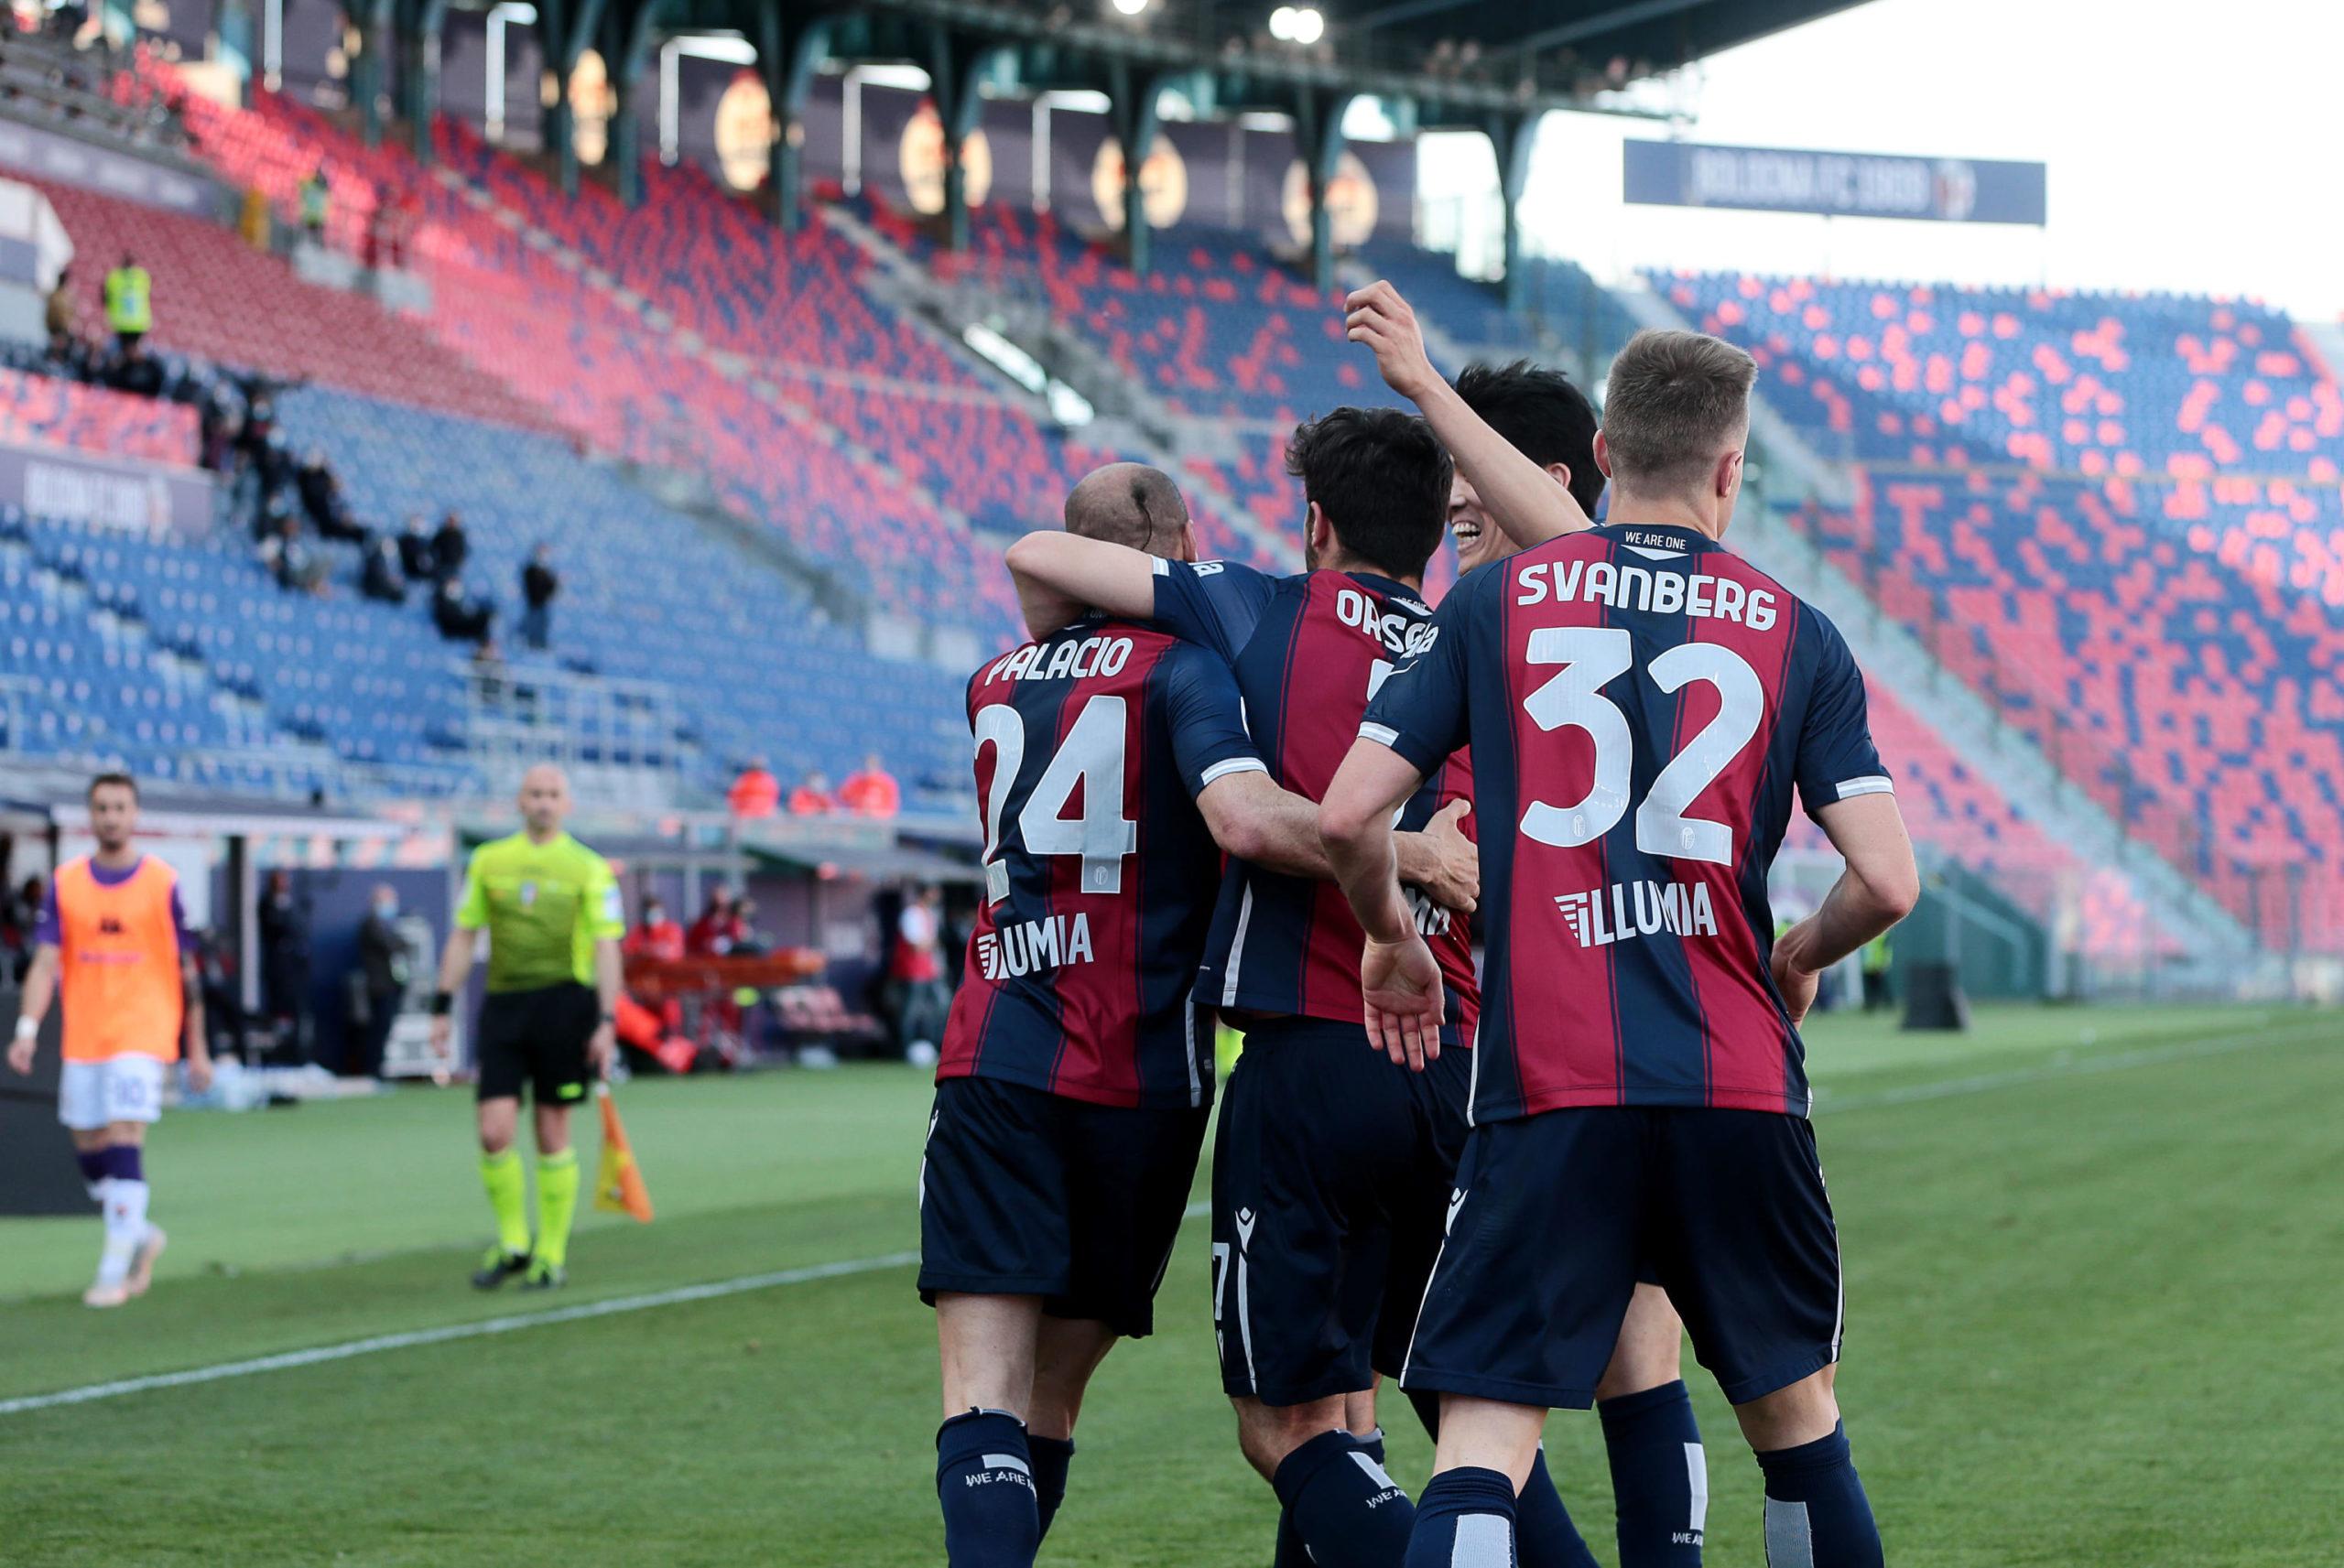 Bologna players celebrate a goal